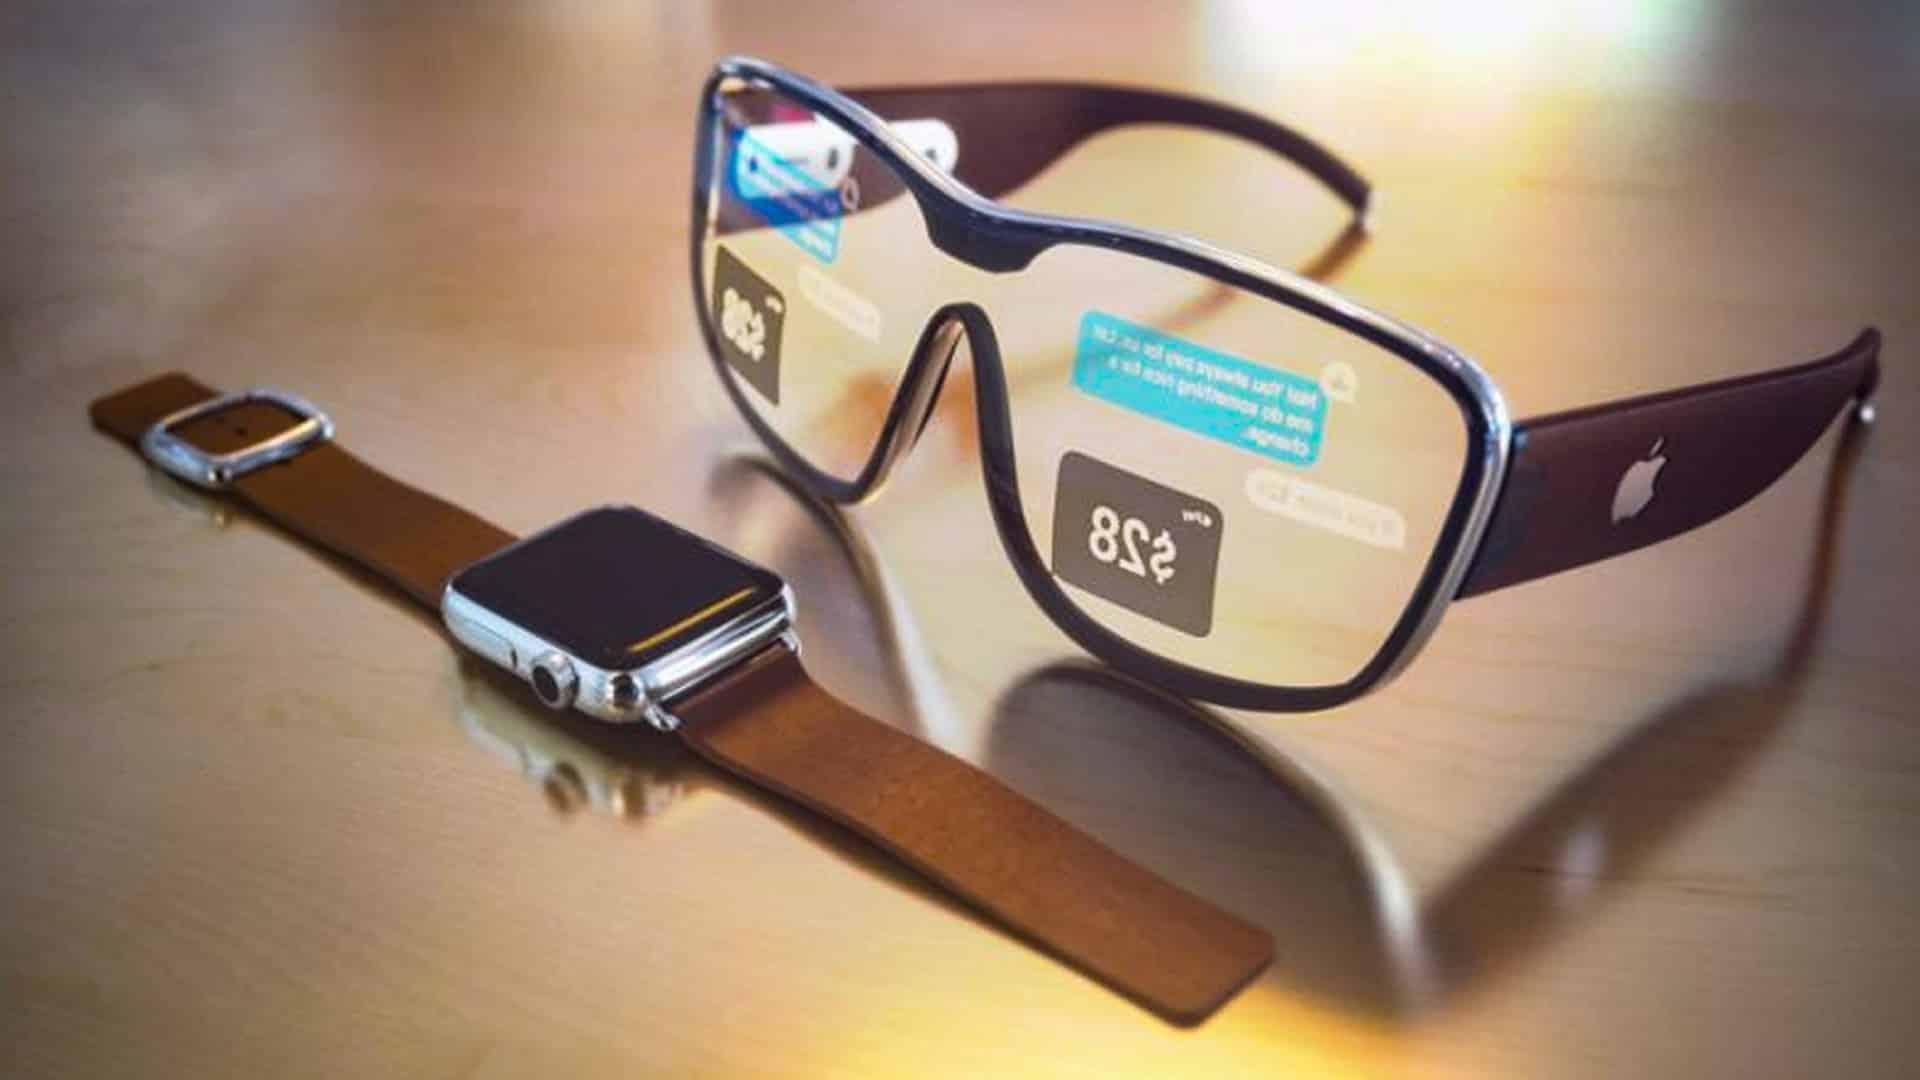 inteligentne okuliare od apple